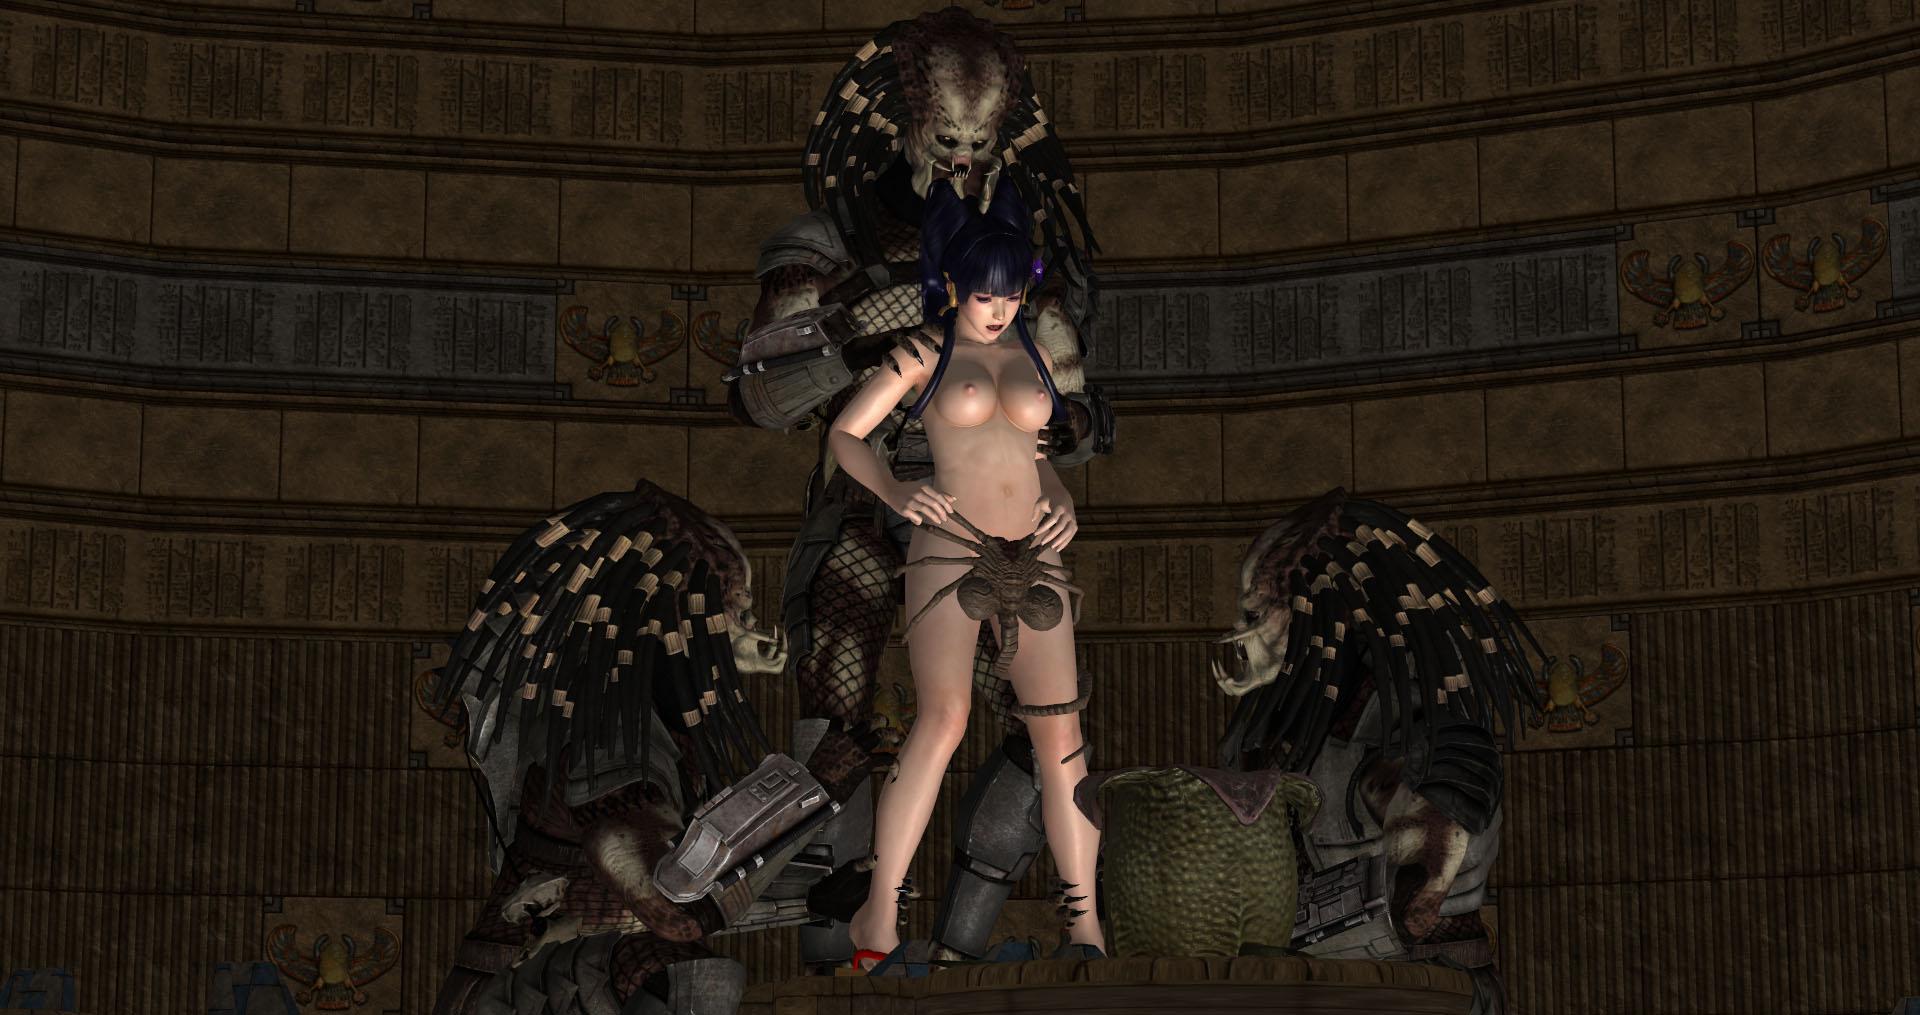 nyotengu_sacrifice_to_pussy_hugger_0047_layer_39_by_bitemonsters-dbgzclx.jpg